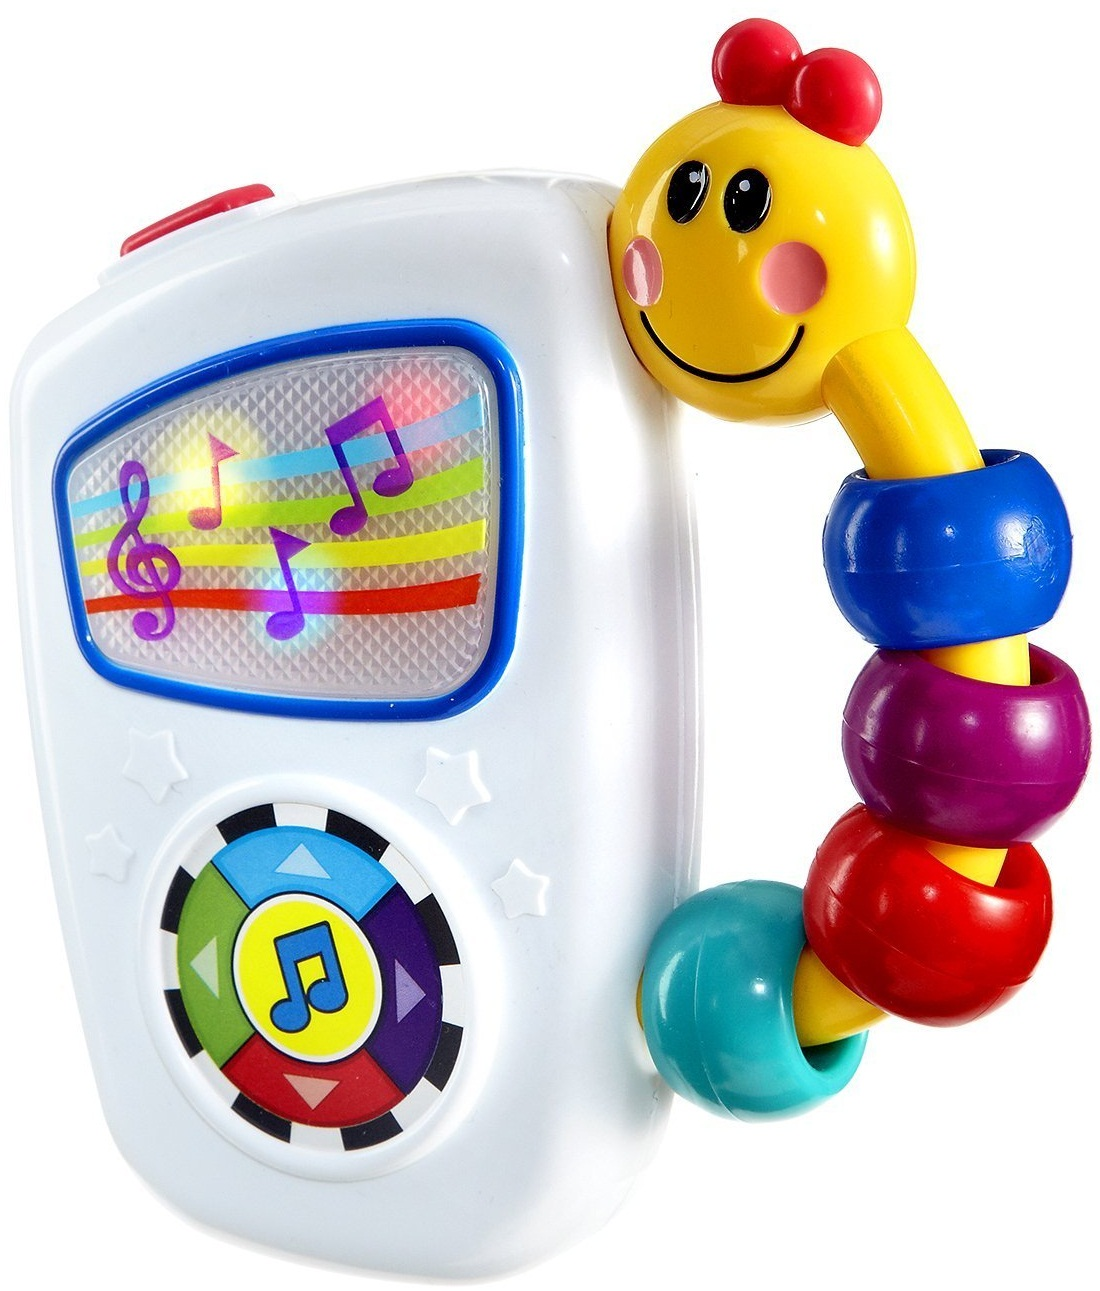 Musical Baby Toys : Baby cinema einstein take along tunes